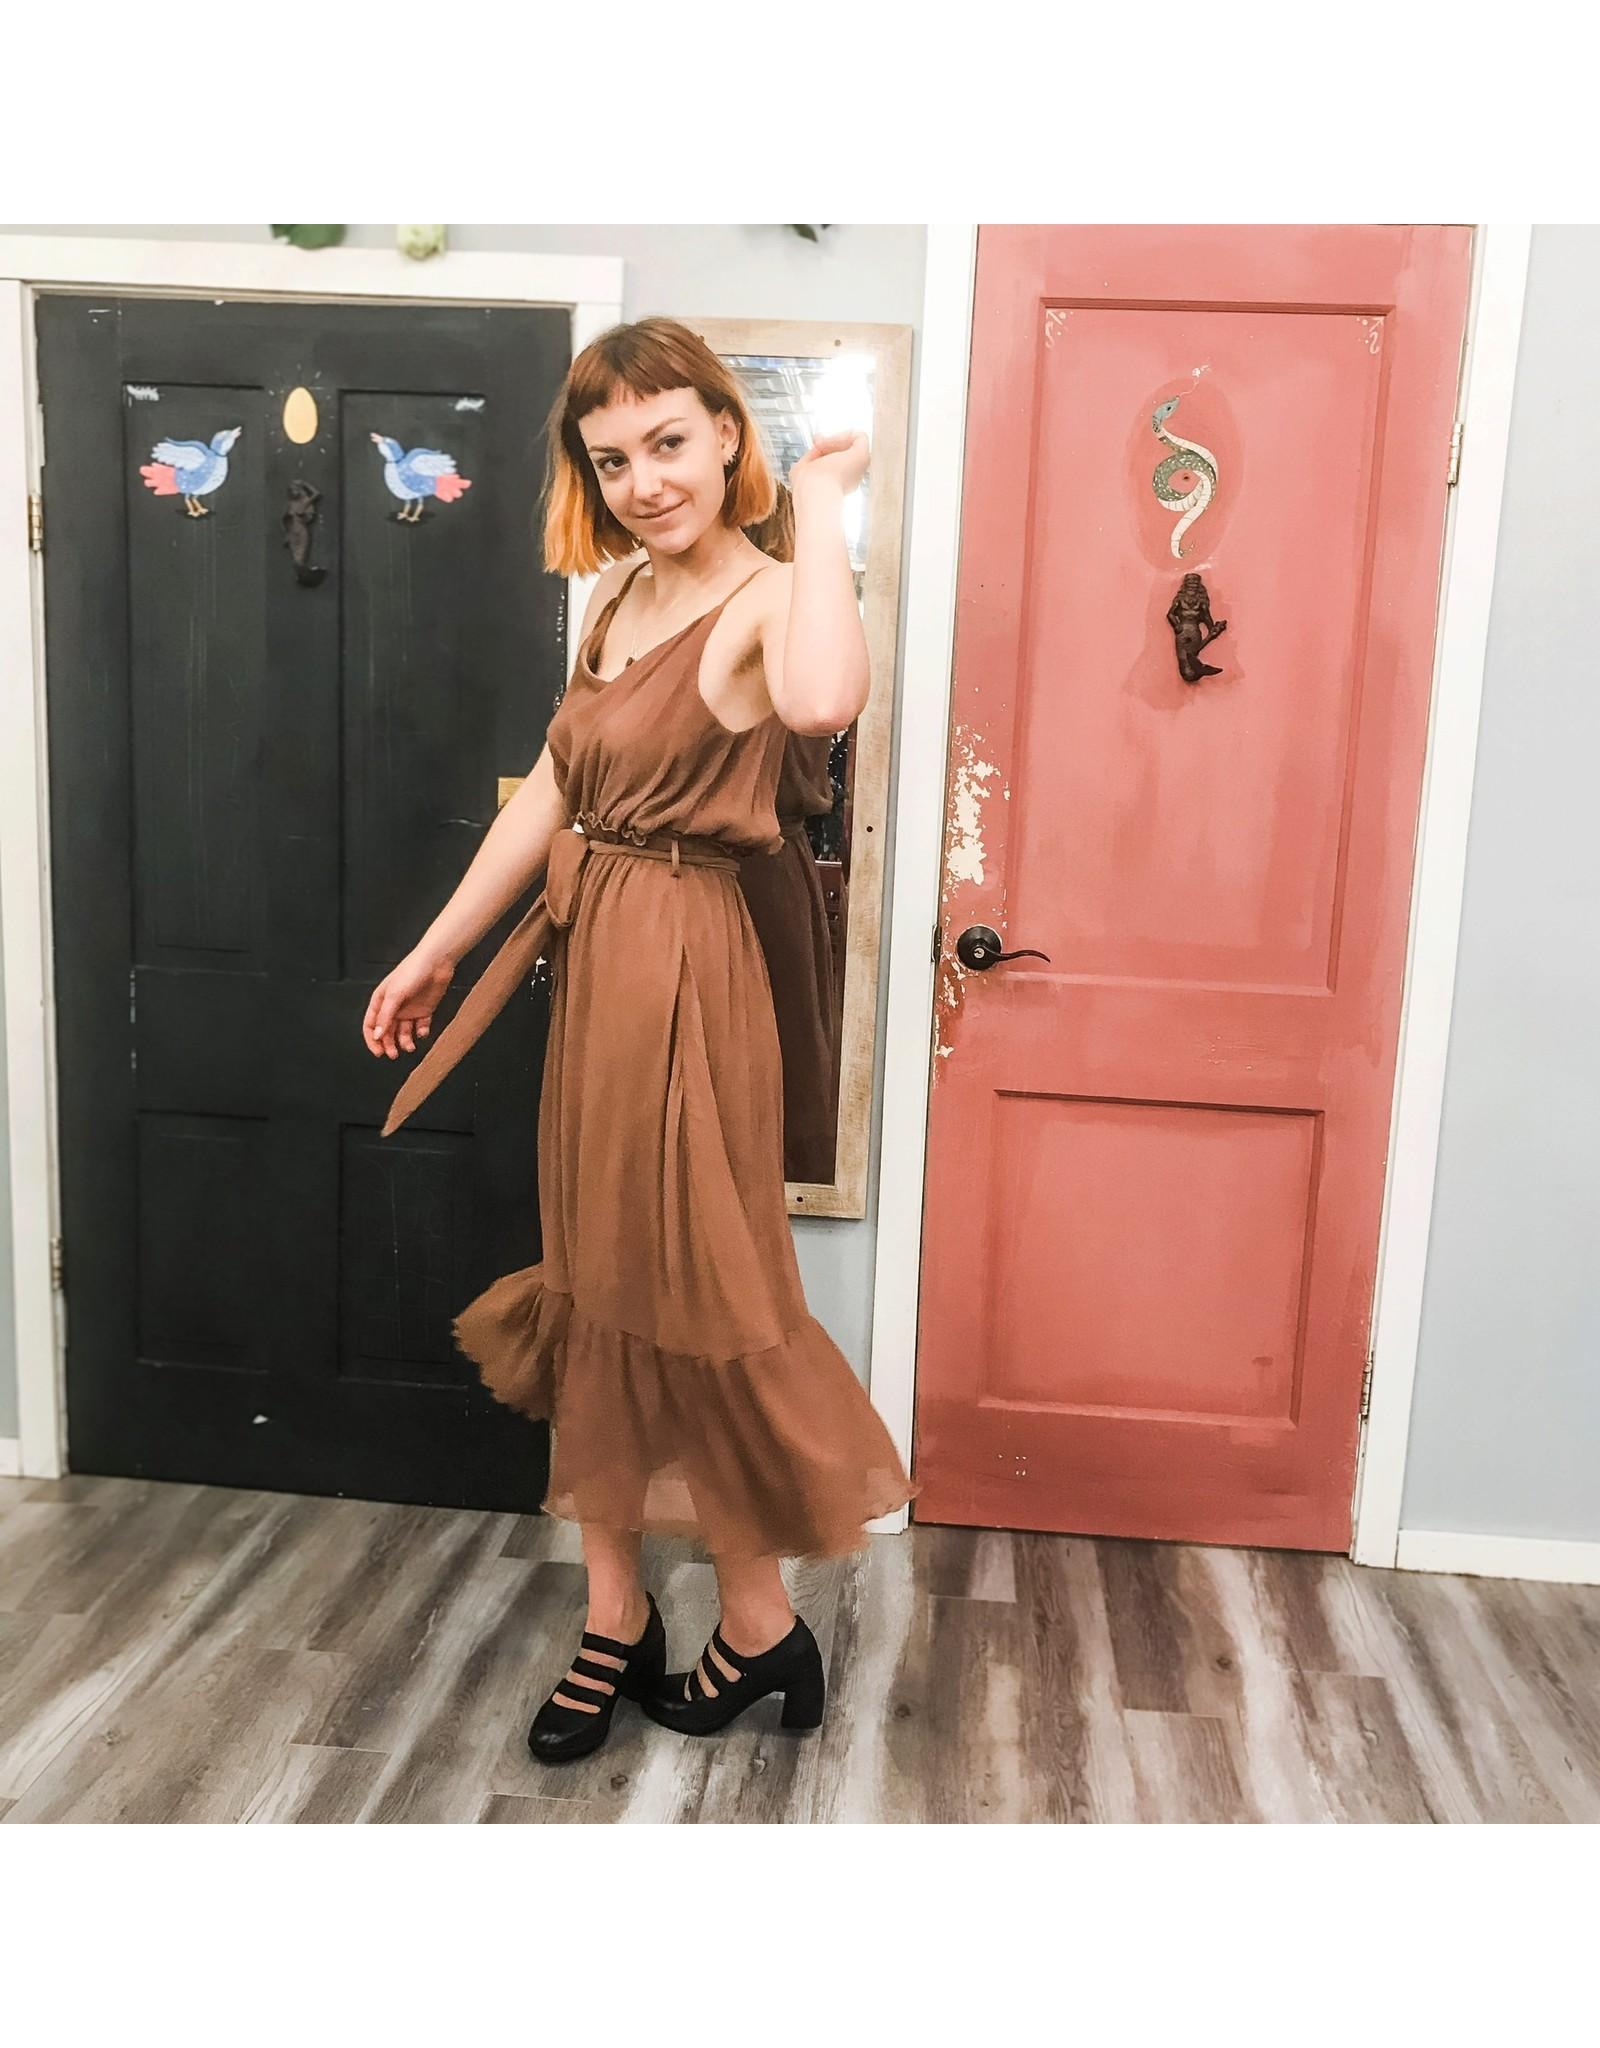 Bonanza - Tiny Dancer Dress